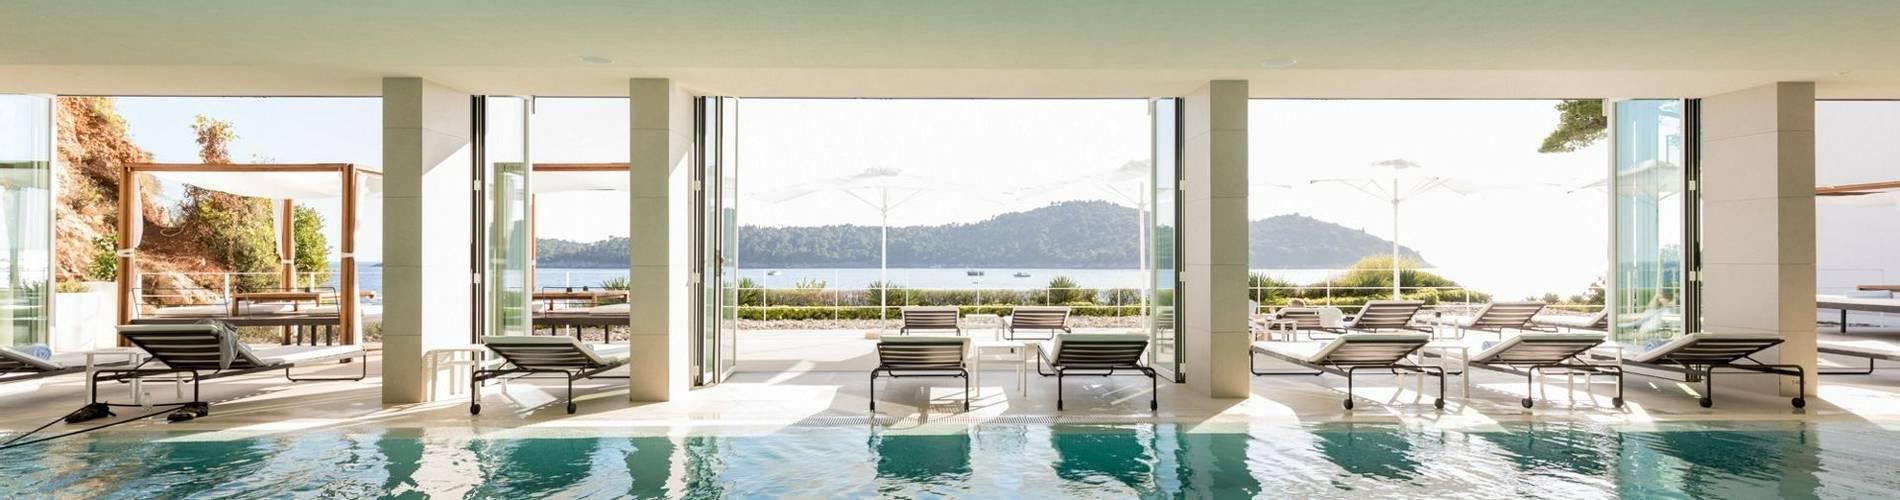 Indoor pool Hotel Villa Dubrovnik.jpg